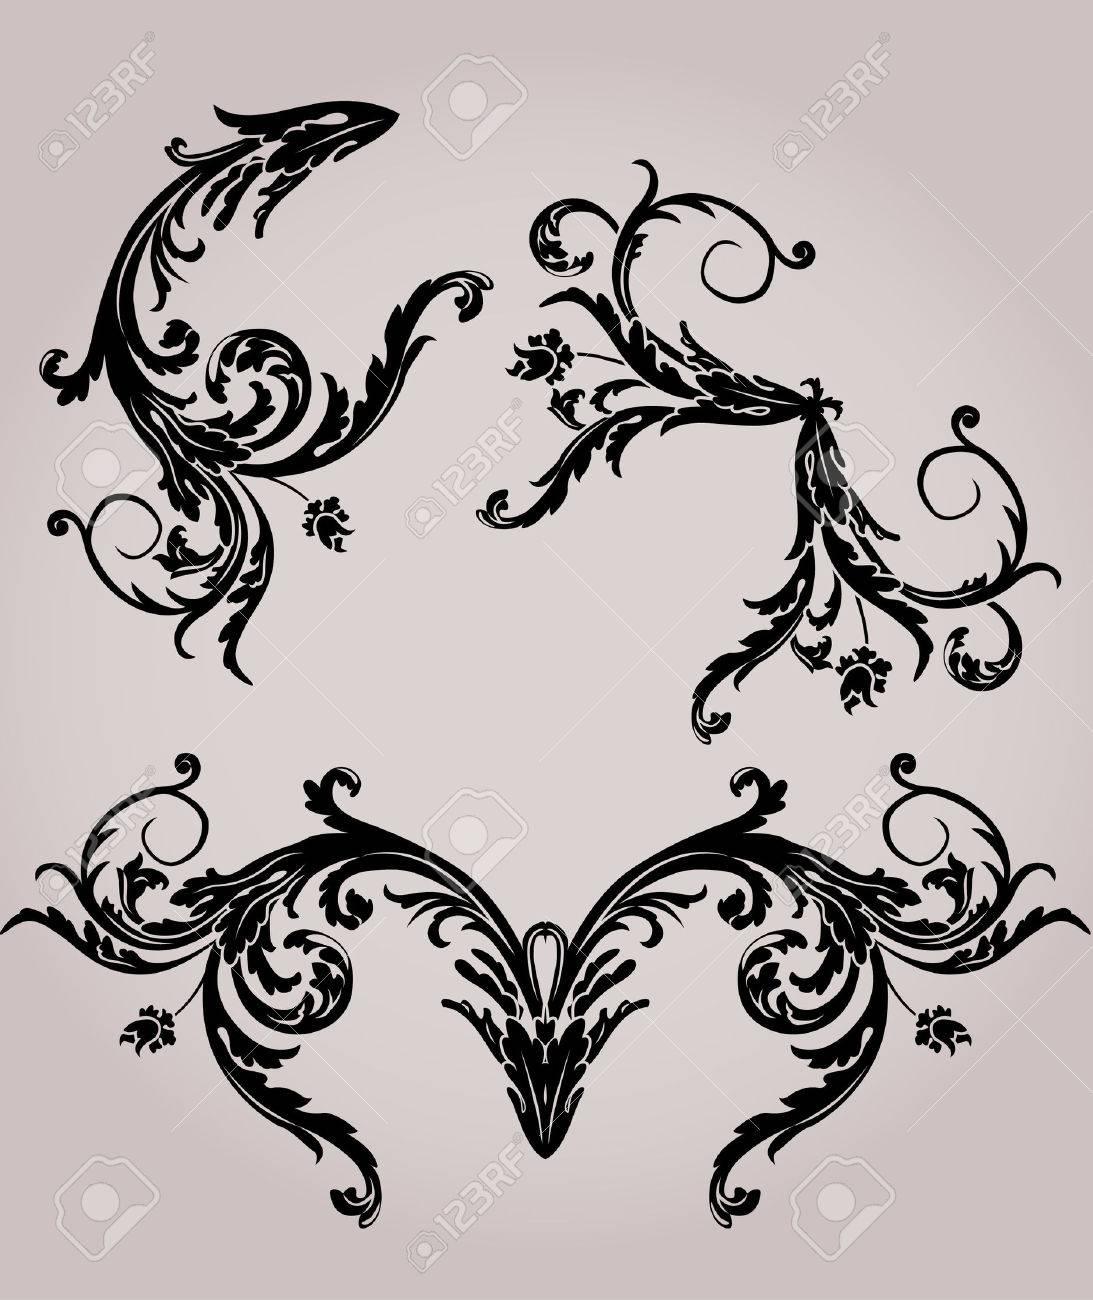 Black floral stencil elements set for design Stock Vector - 7023756